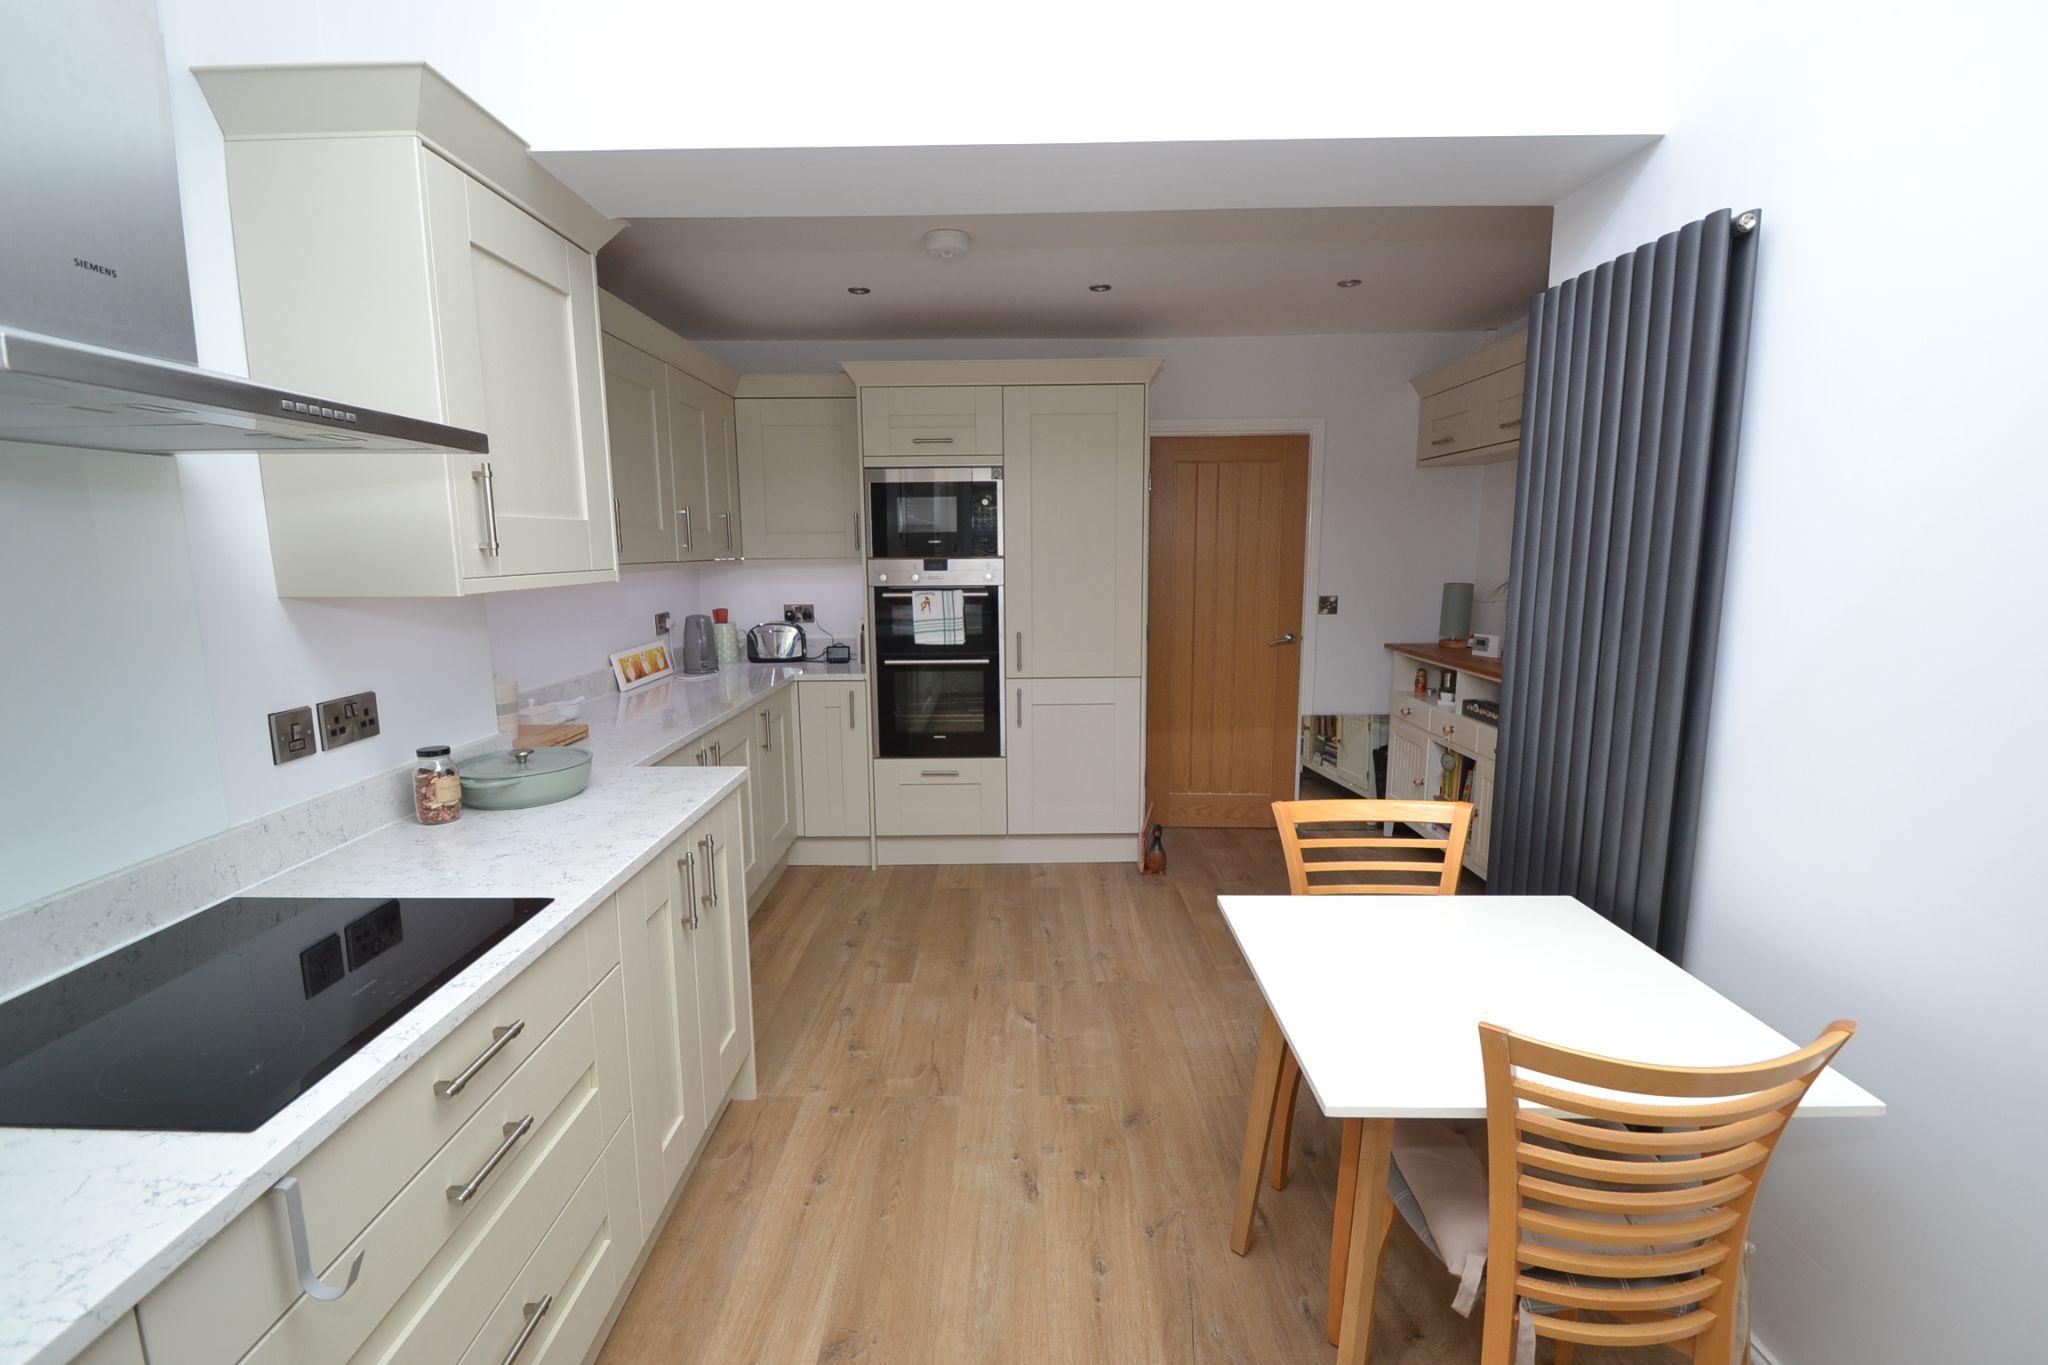 2 Bedroom Semi-detached Dormer House For Sale - Photograph 10